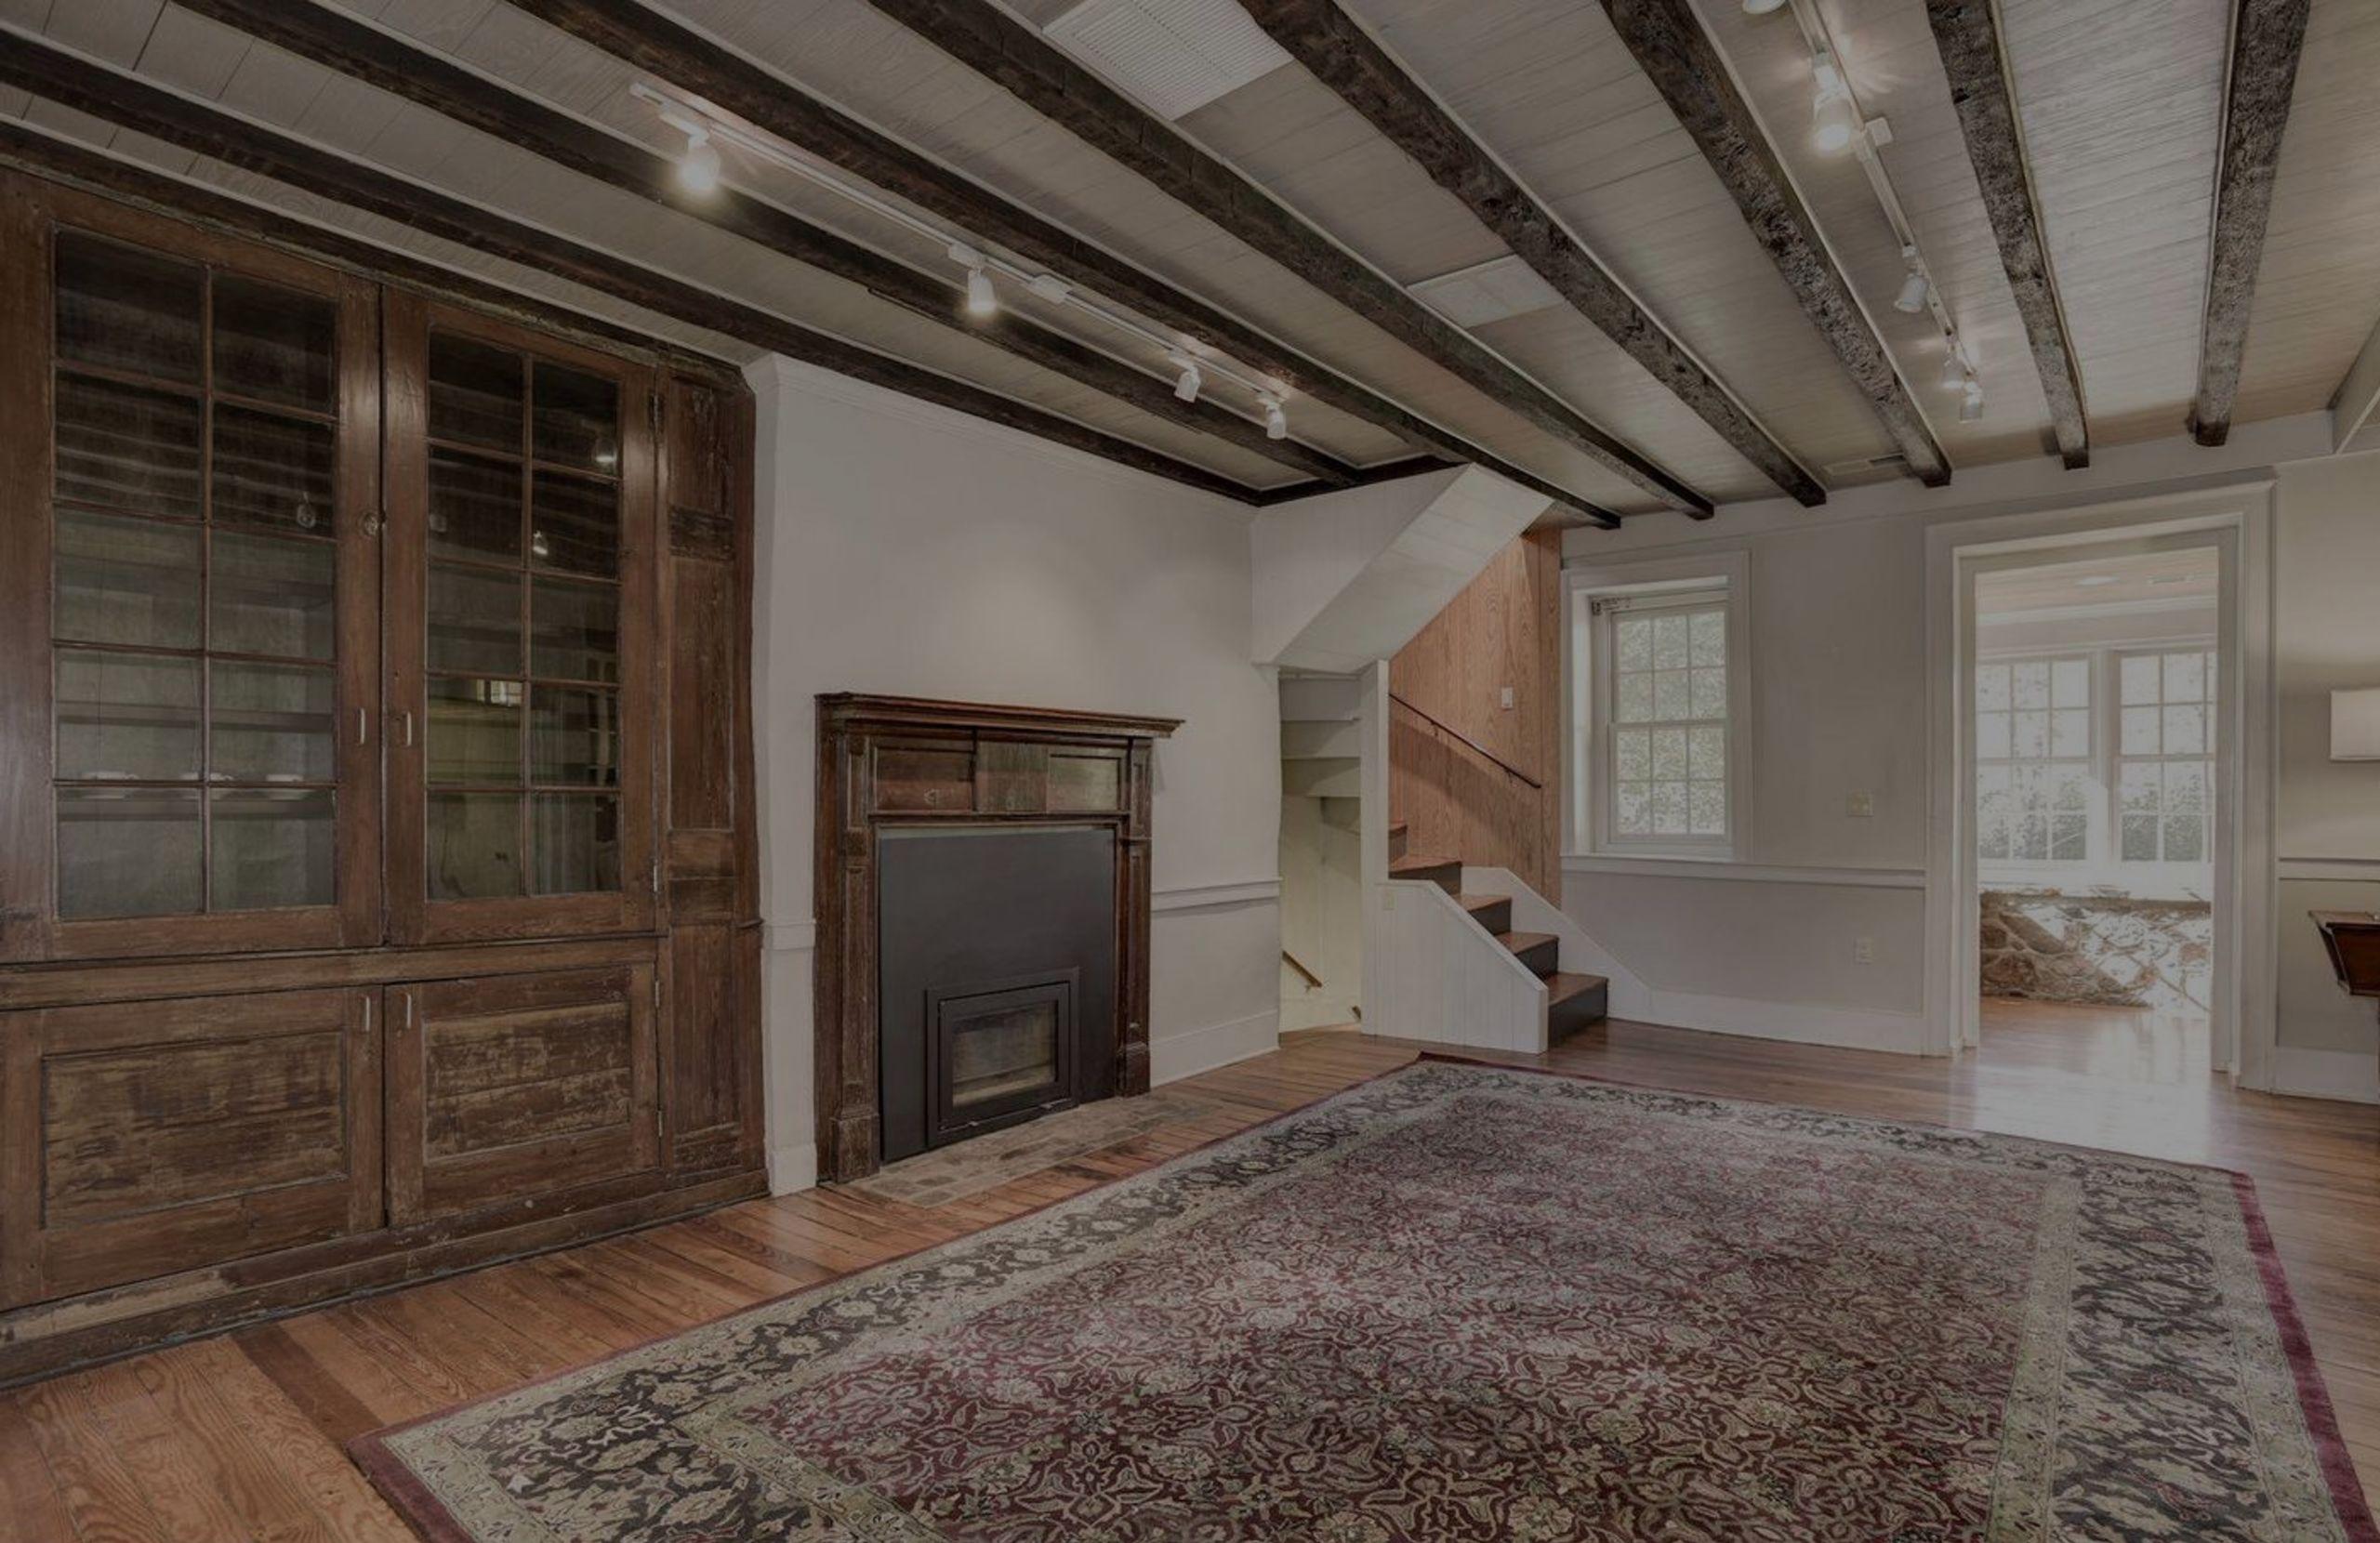 Open Houses | 11/3-4 in Loudoun & Fauquier